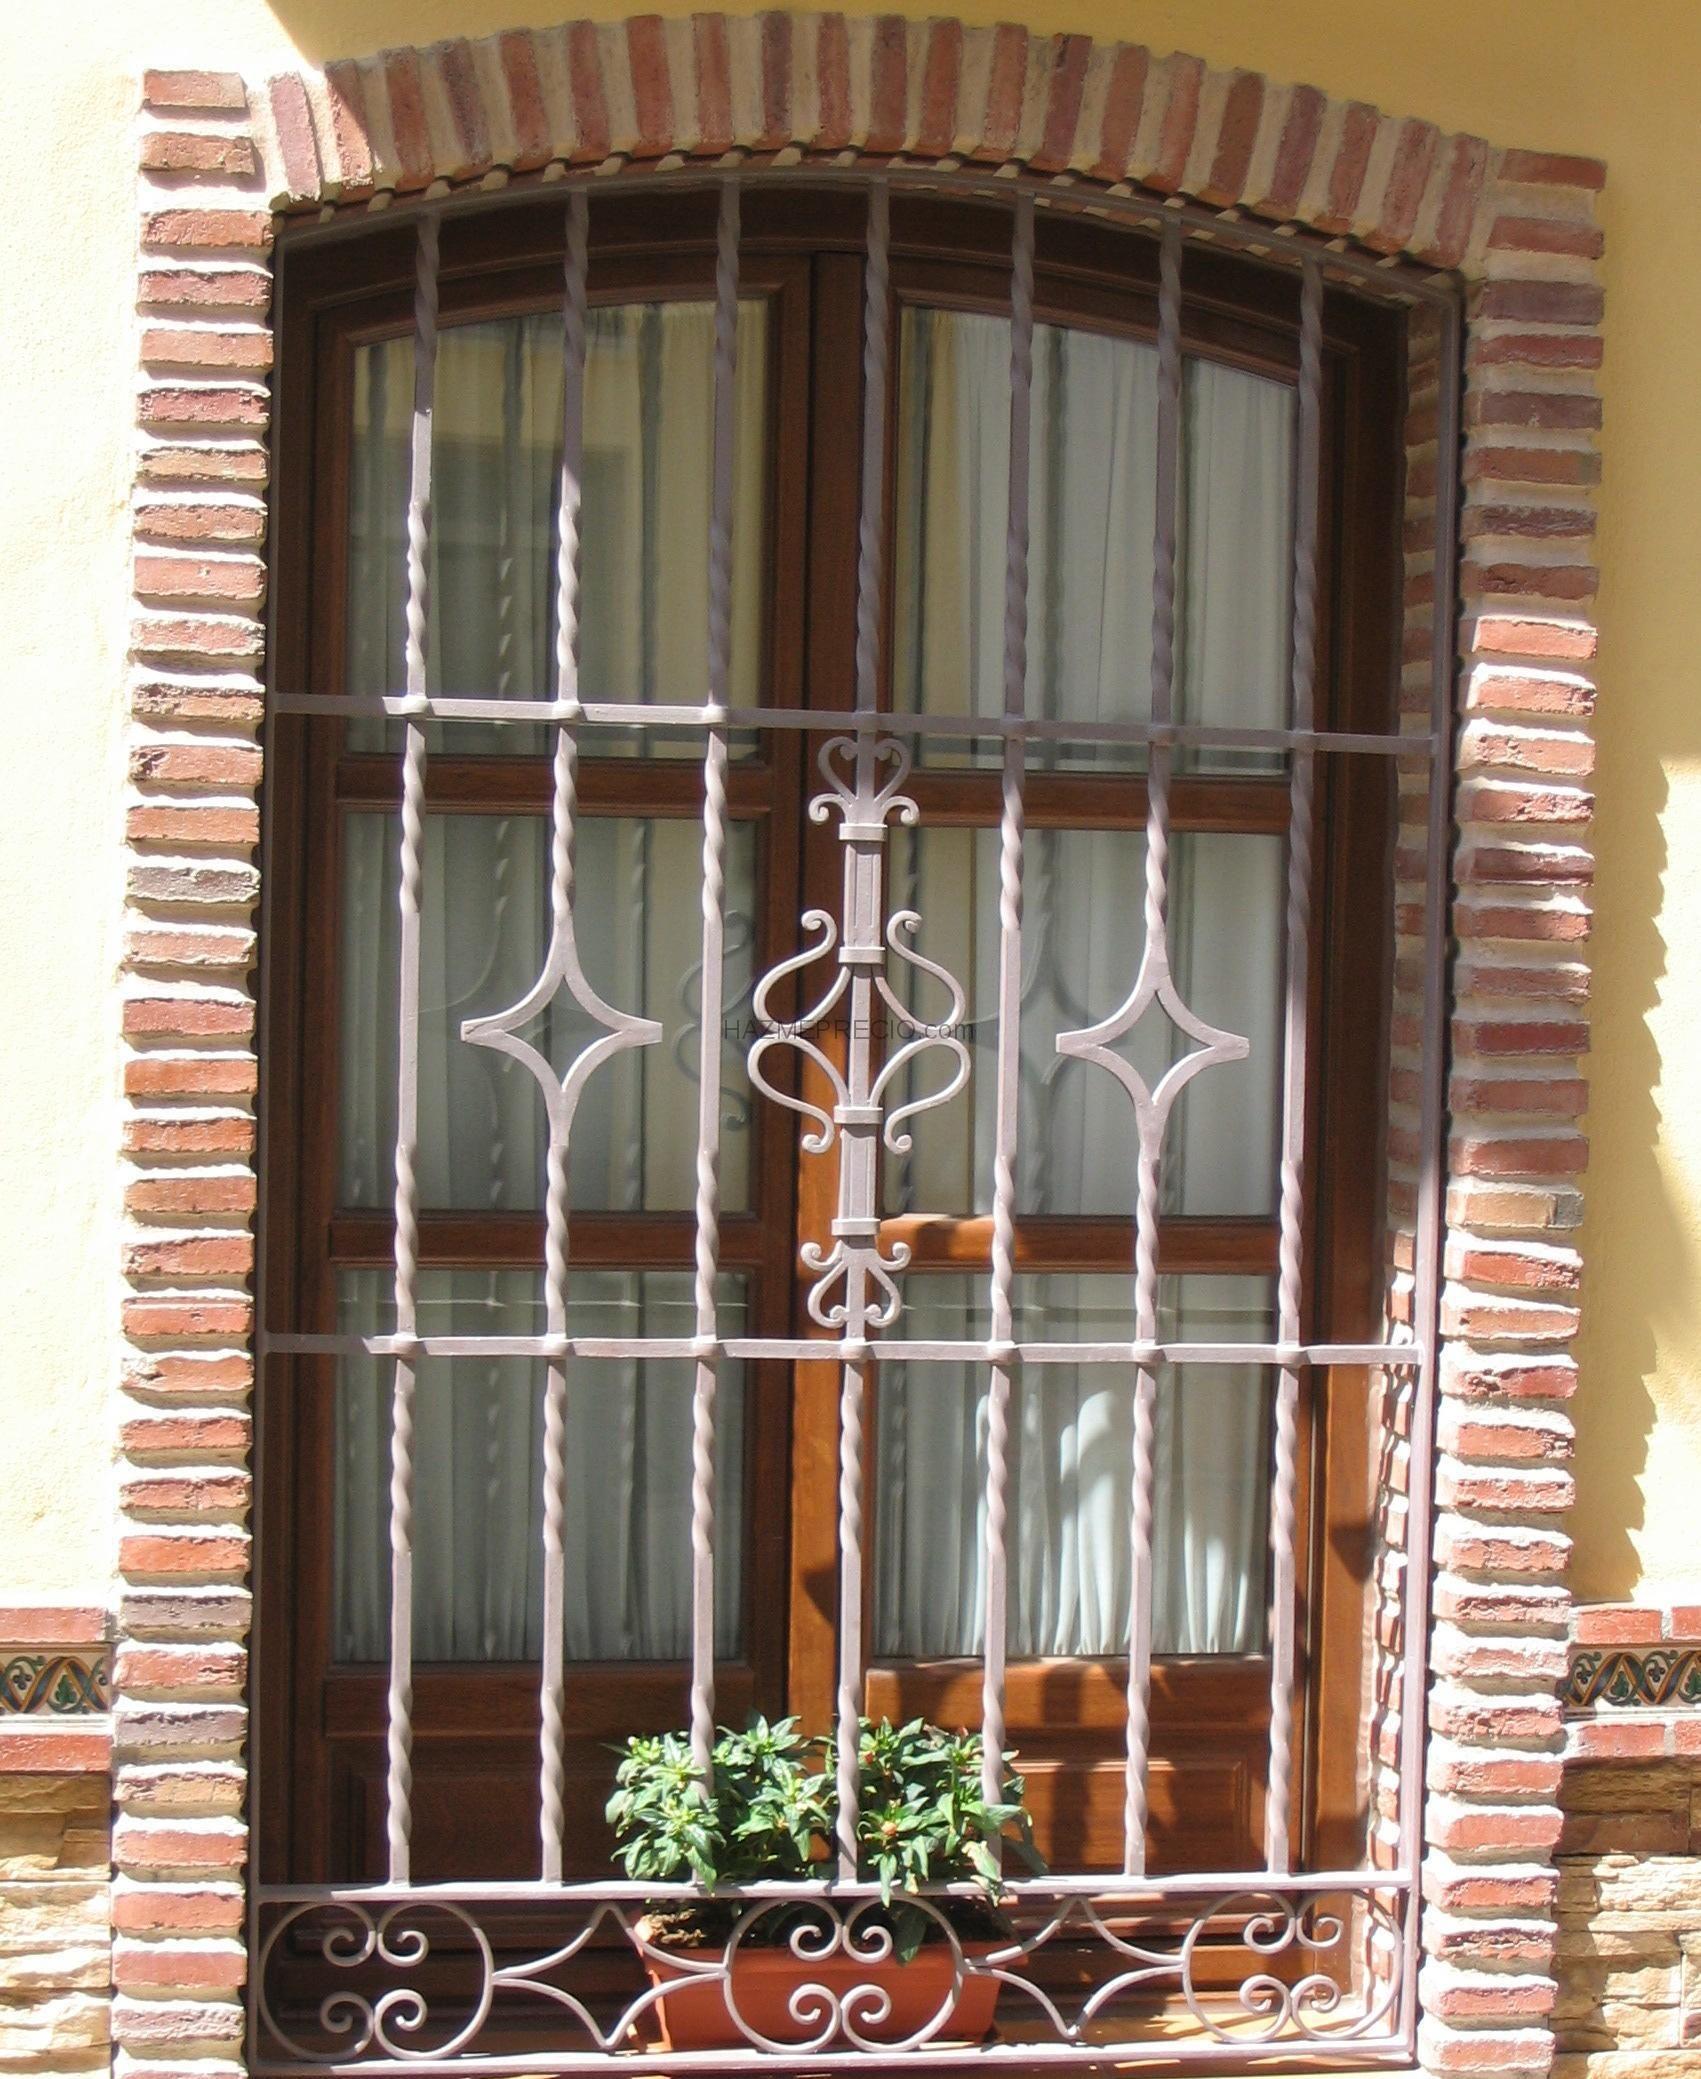 Window Replacement Estimate estimate request keller